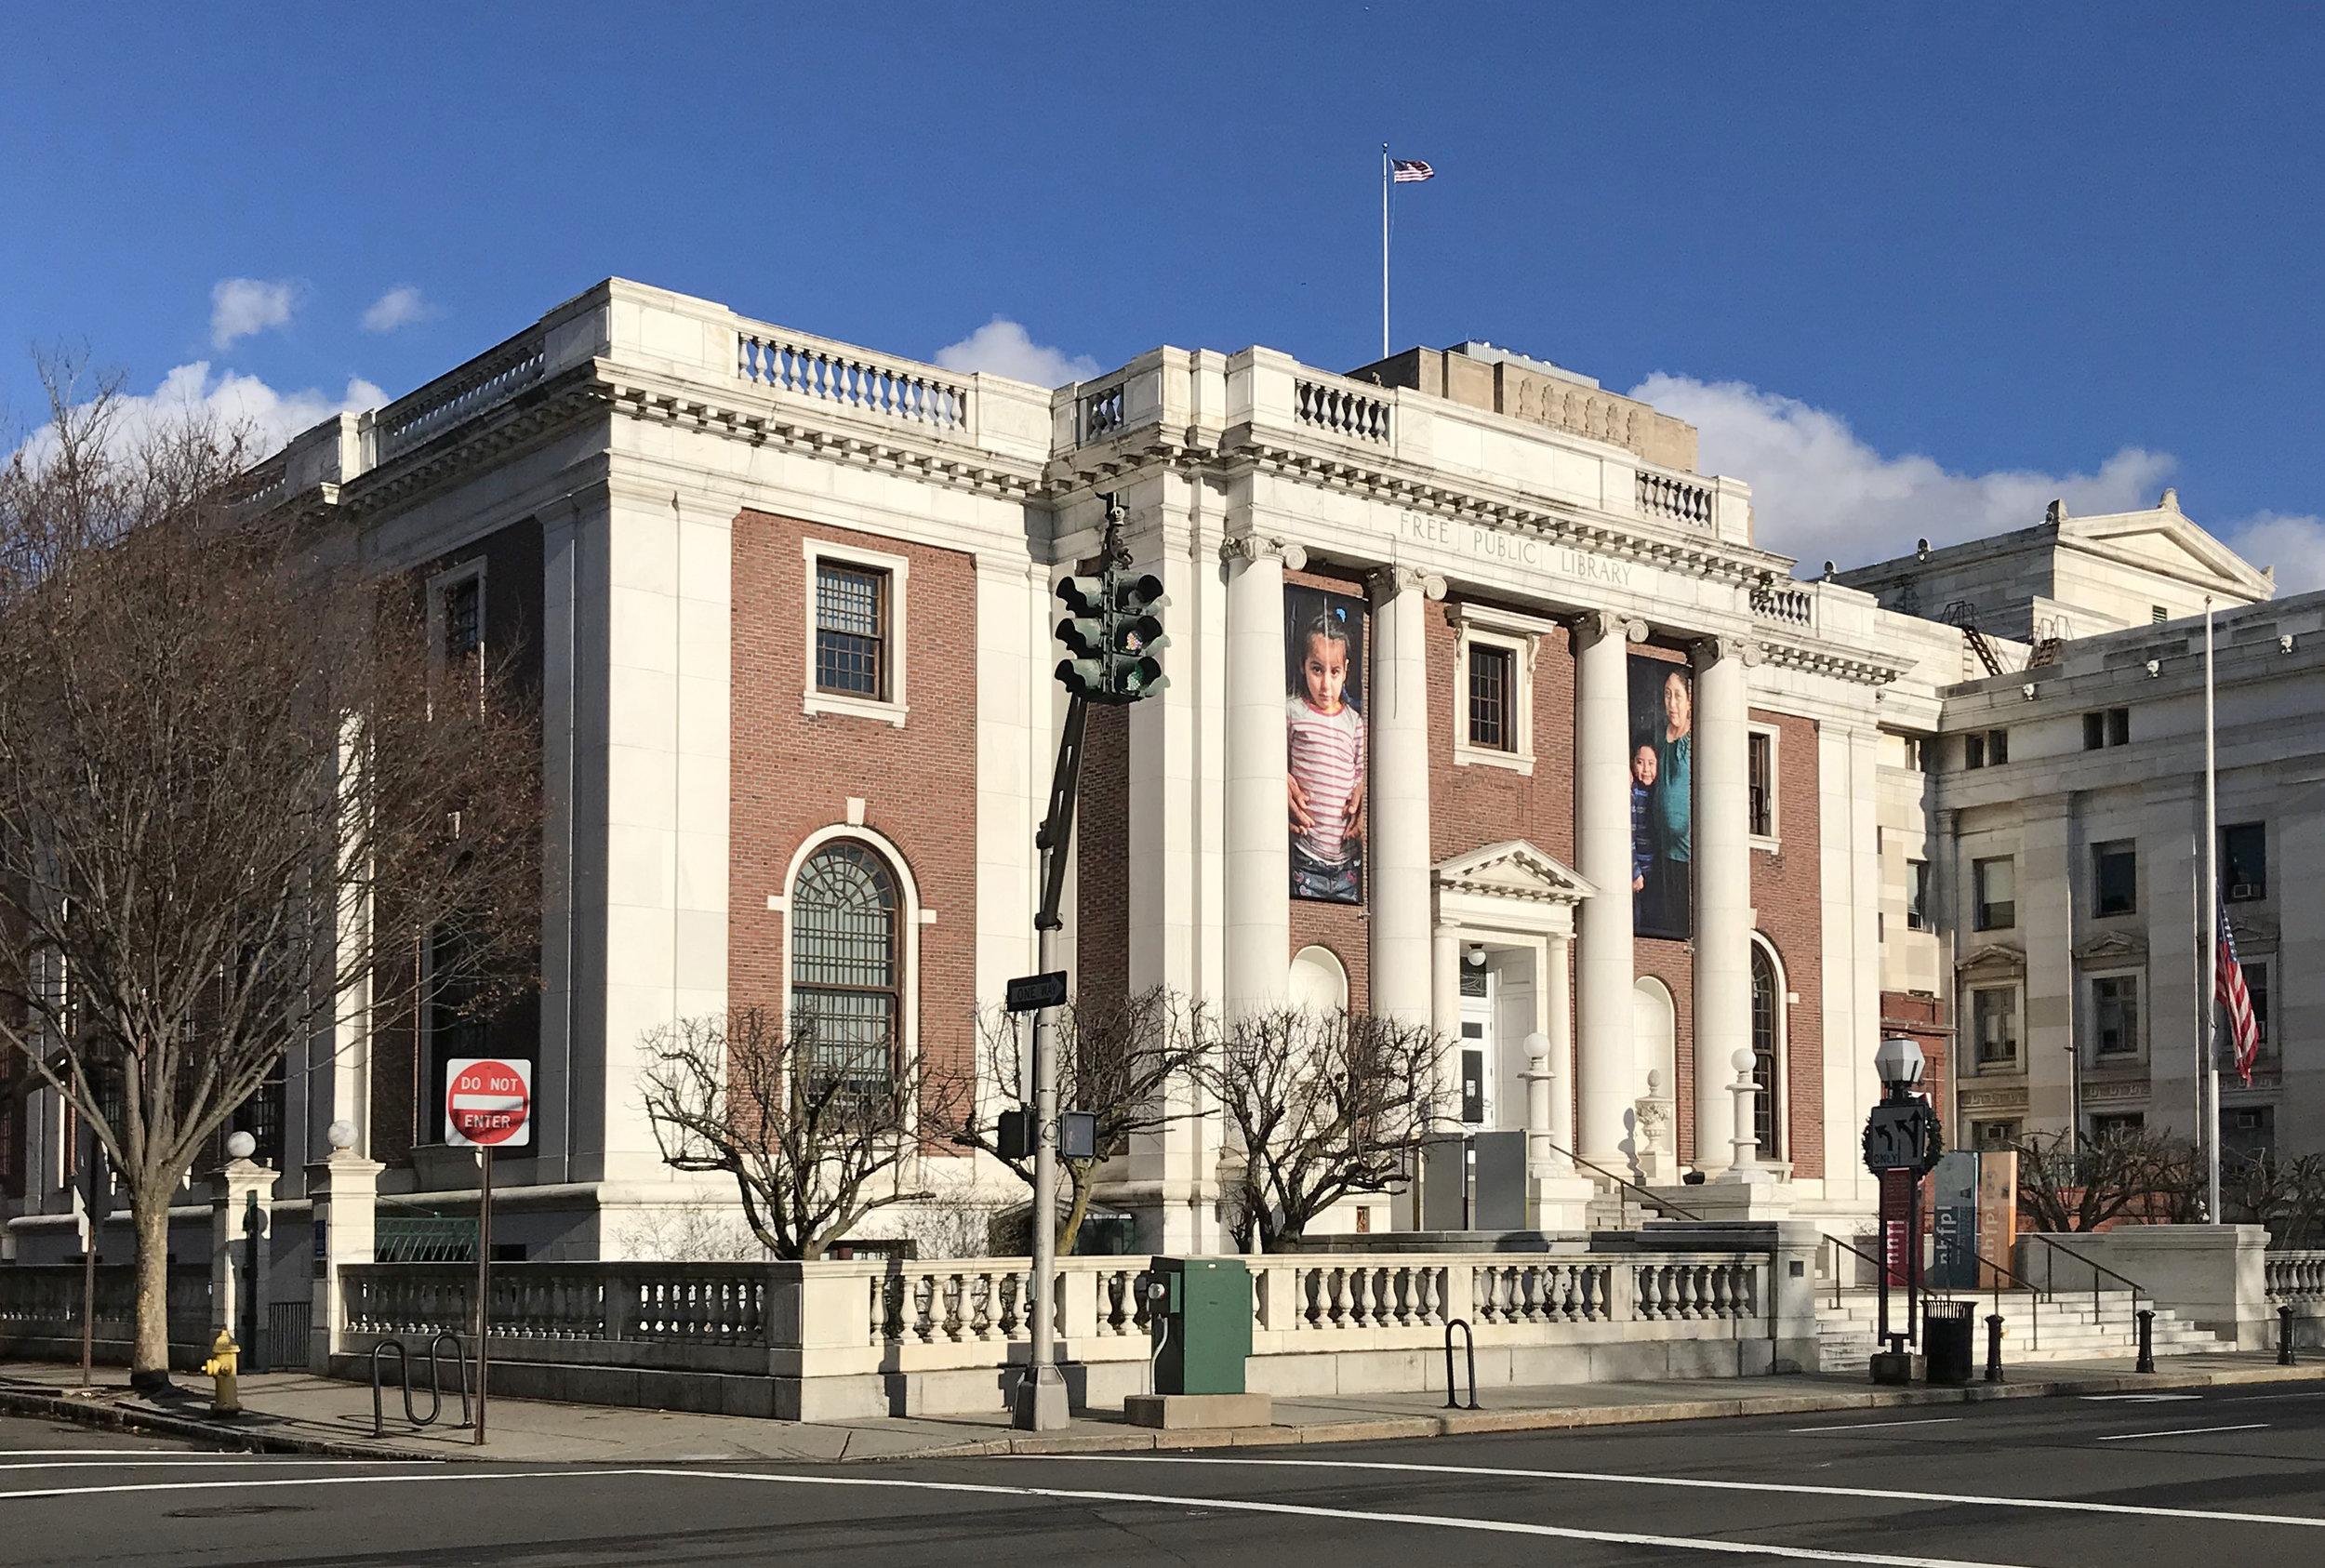 New Haven Free Public Library, 133 Elm Street. Architect: Cass Gilbert, 1908.